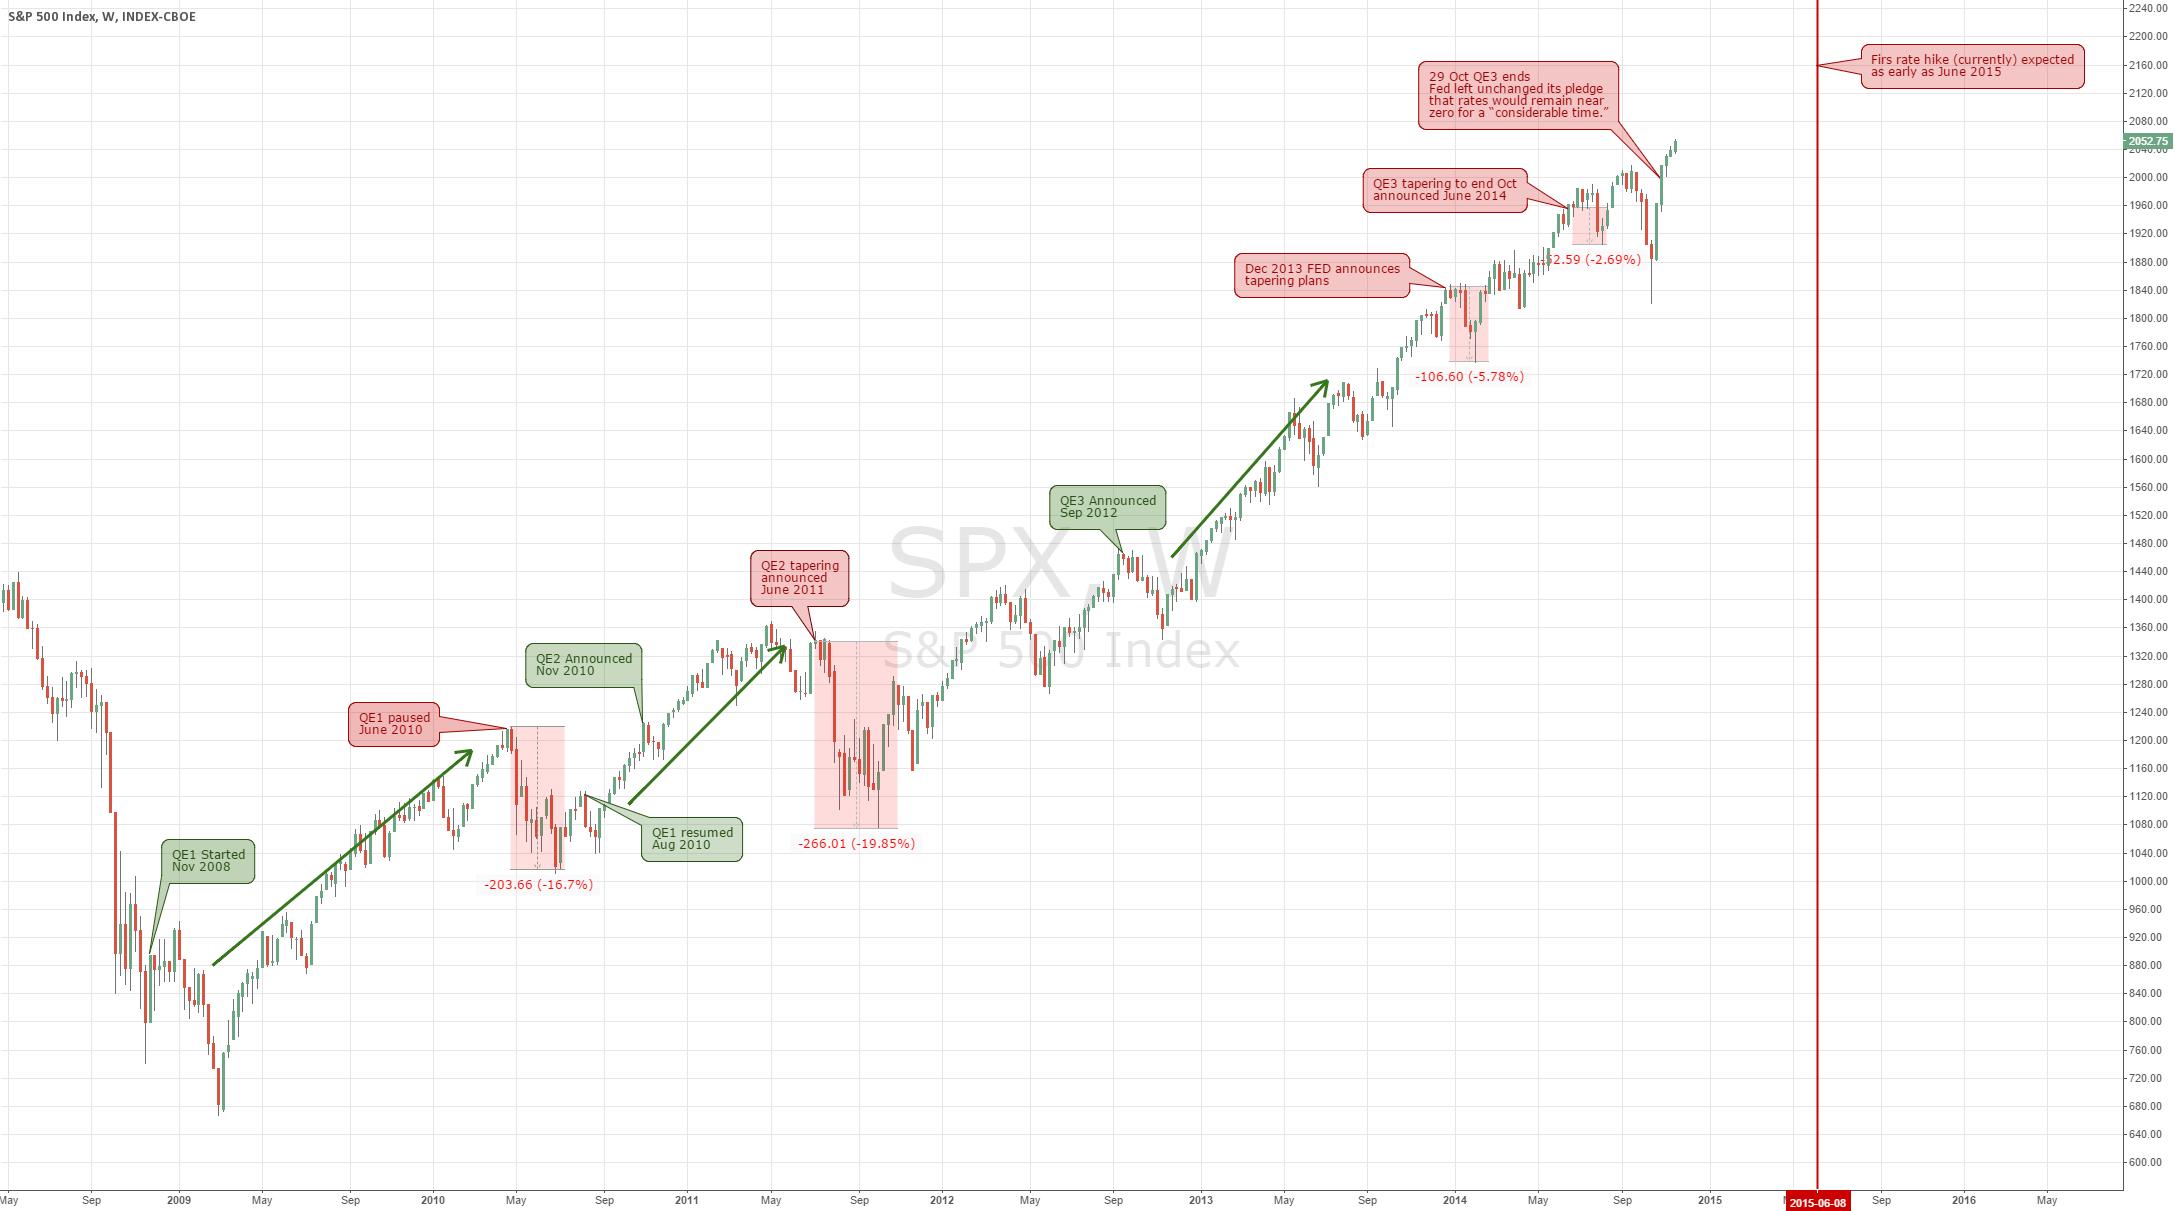 HOW QUANTITATIVE EASING AFFECTS STOCK MARKET? (UPDATE)